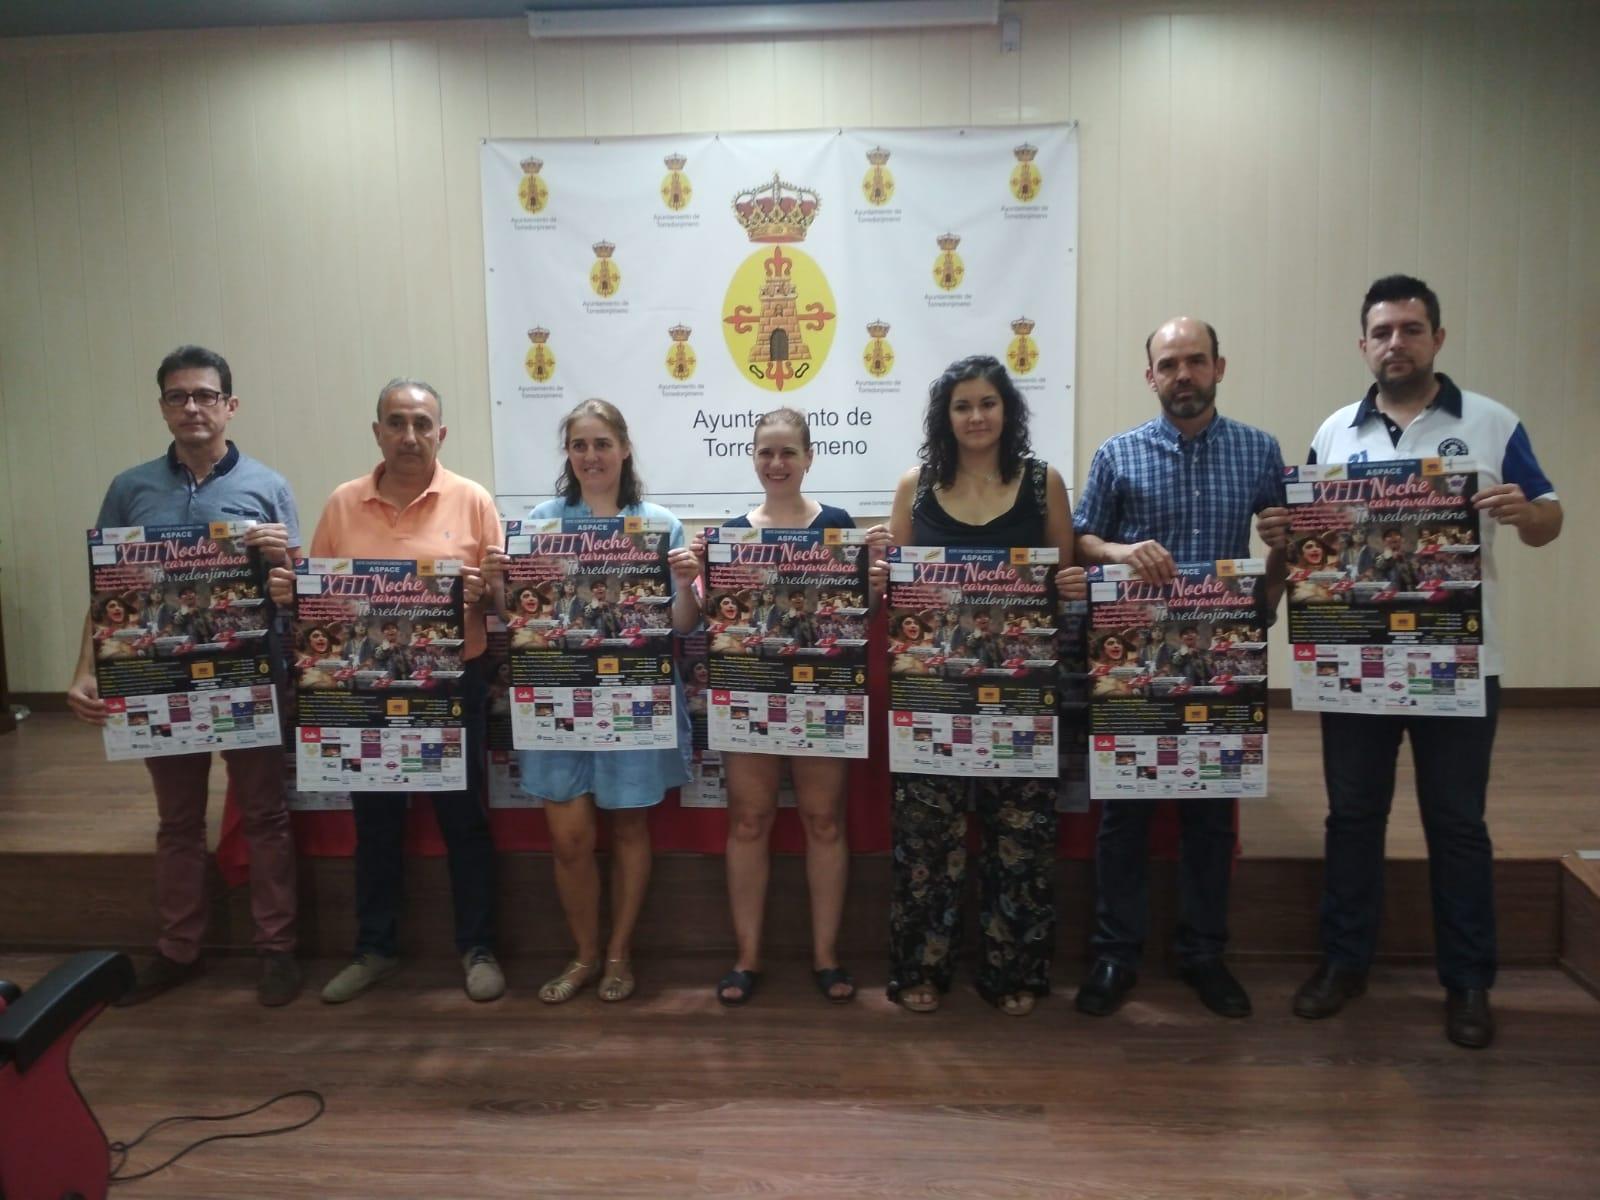 Se presenta oficialmente XIII Noche Carnavalesca de torredonjimeno